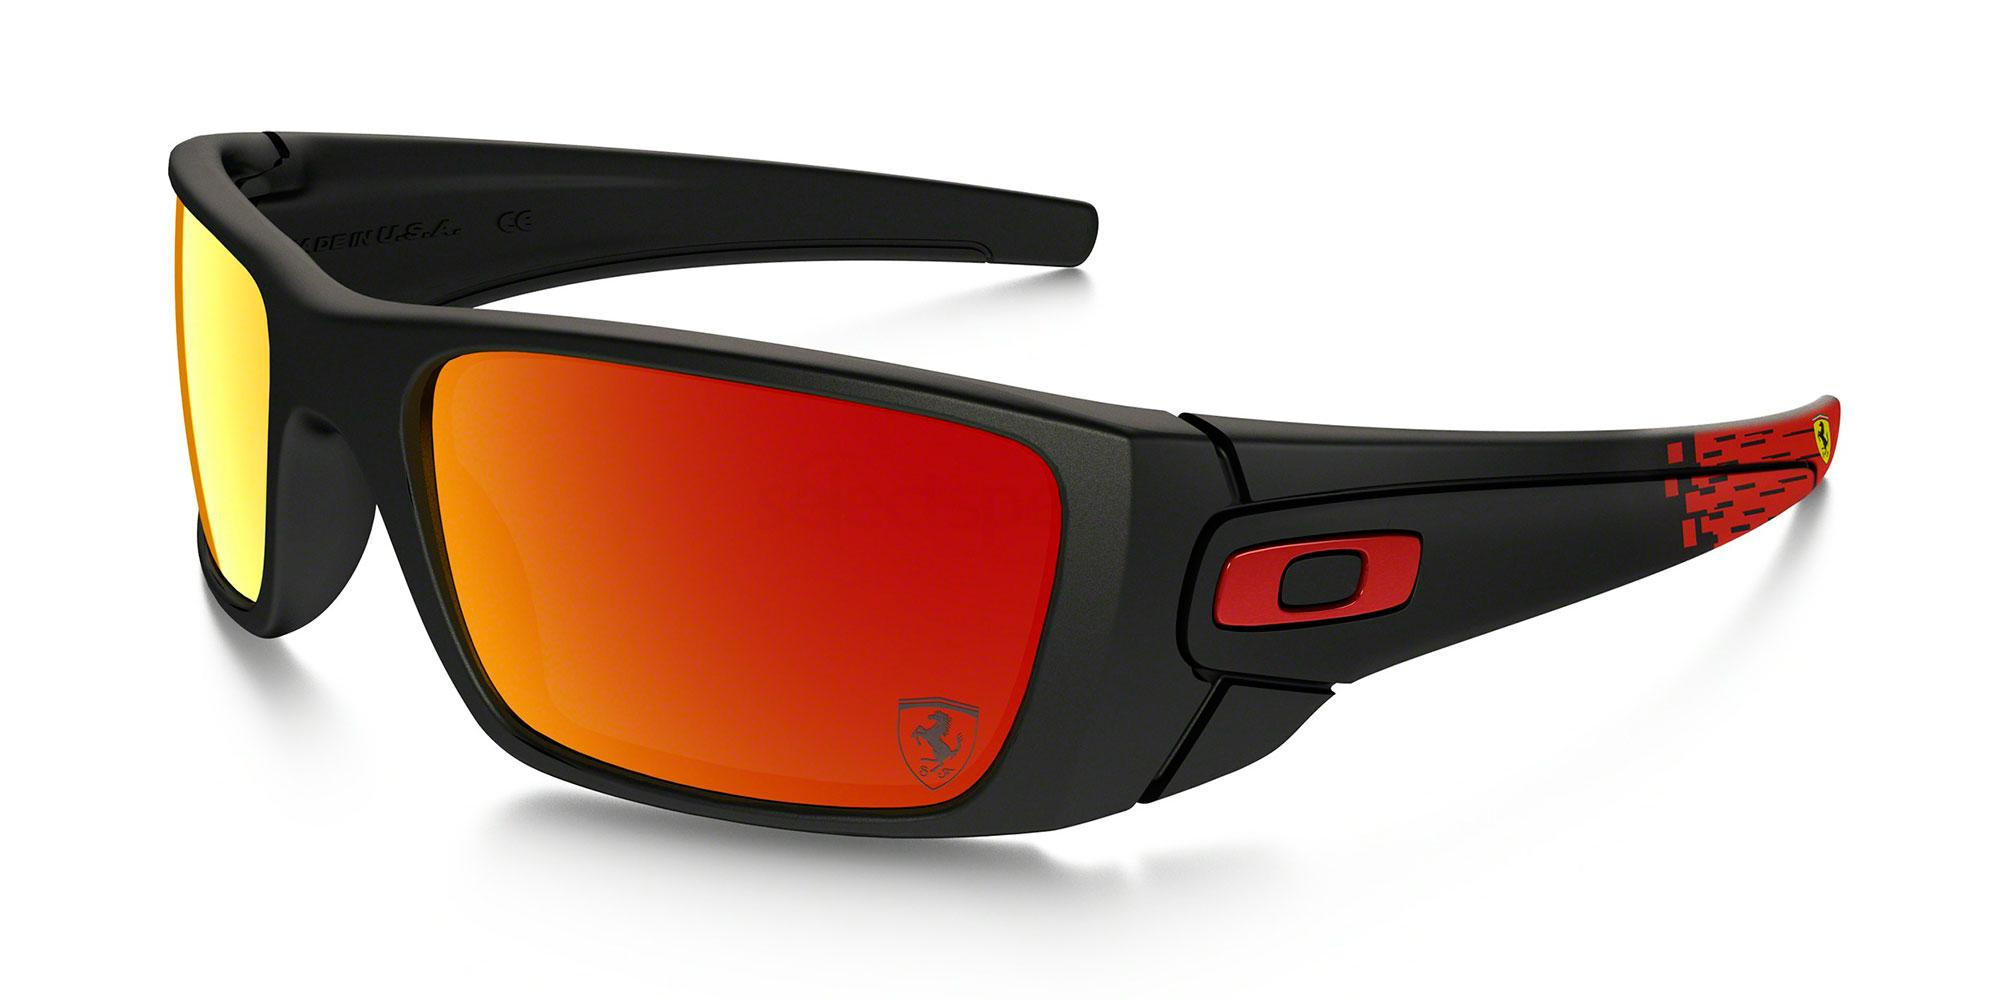 9096A8 OO9096 SPECIAL EDITION FERRARI FUEL CELL Sunglasses, Oakley